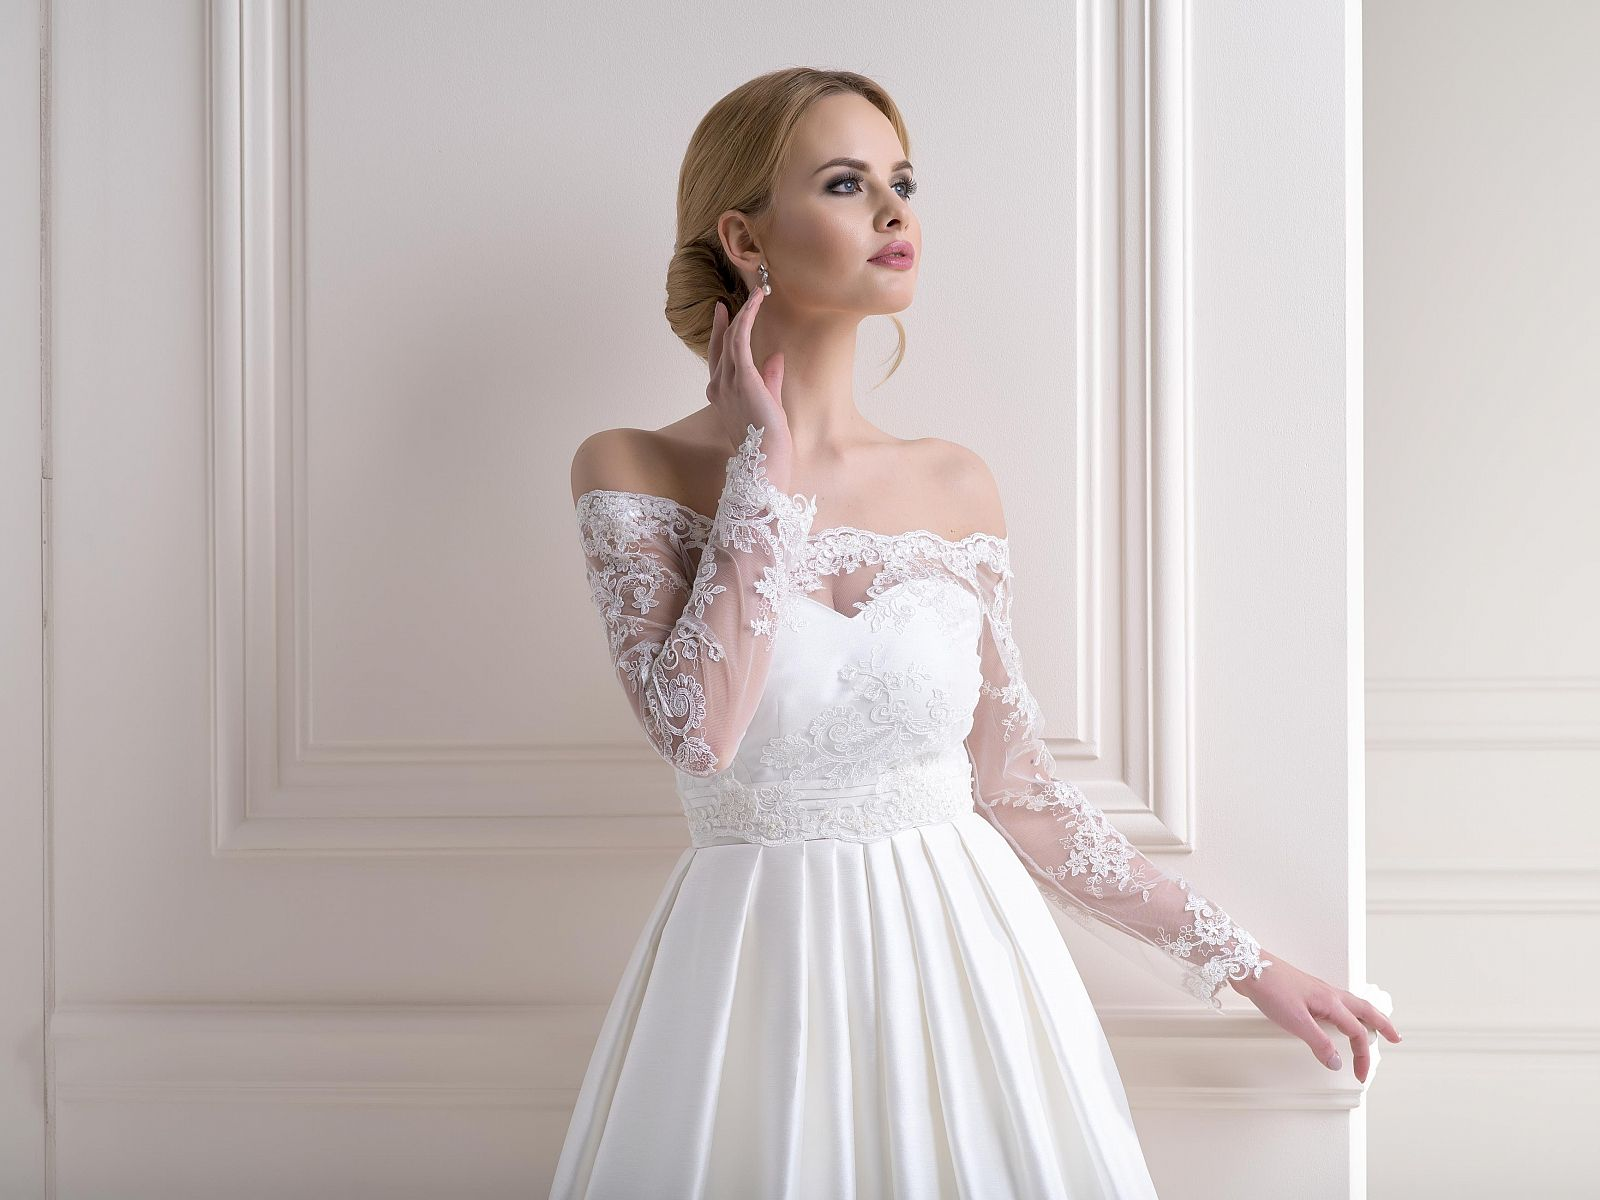 Lace Bardot Bolero Dress Topper Long Sleeve Rear Tie. A